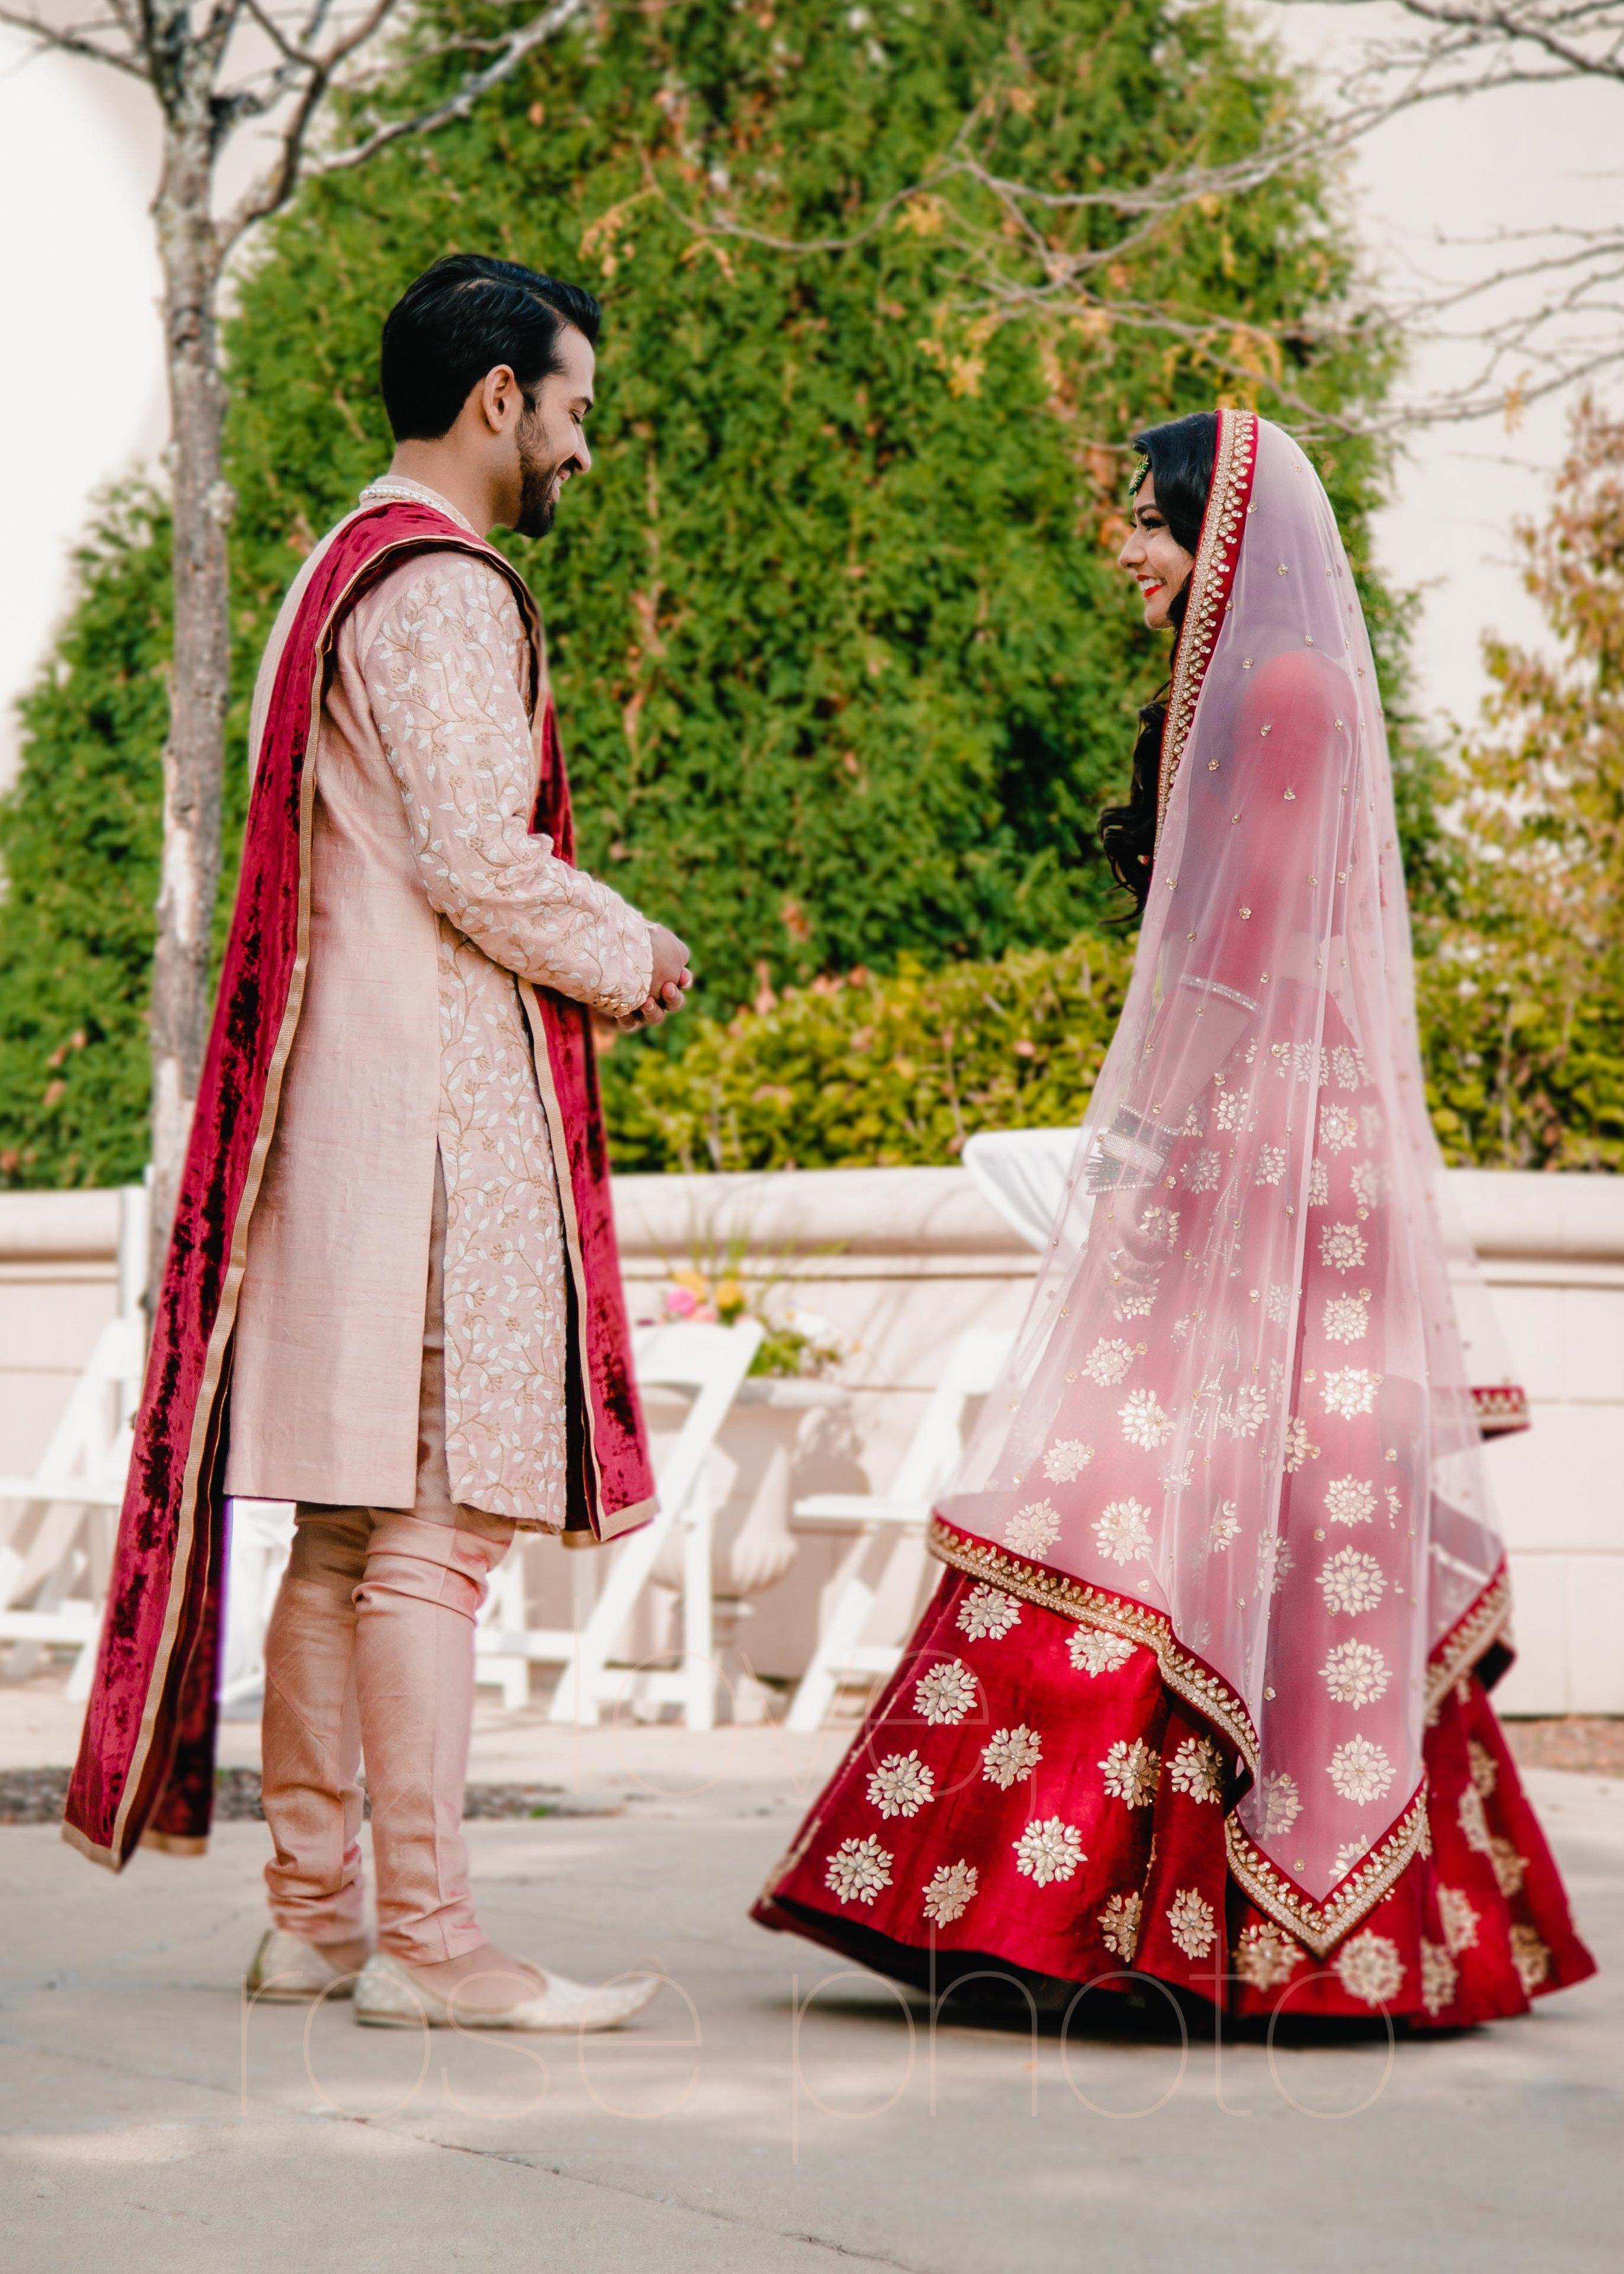 Chicago Indian Wedding best photography lifestyle wedding portrait luxury wedding-6.jpg